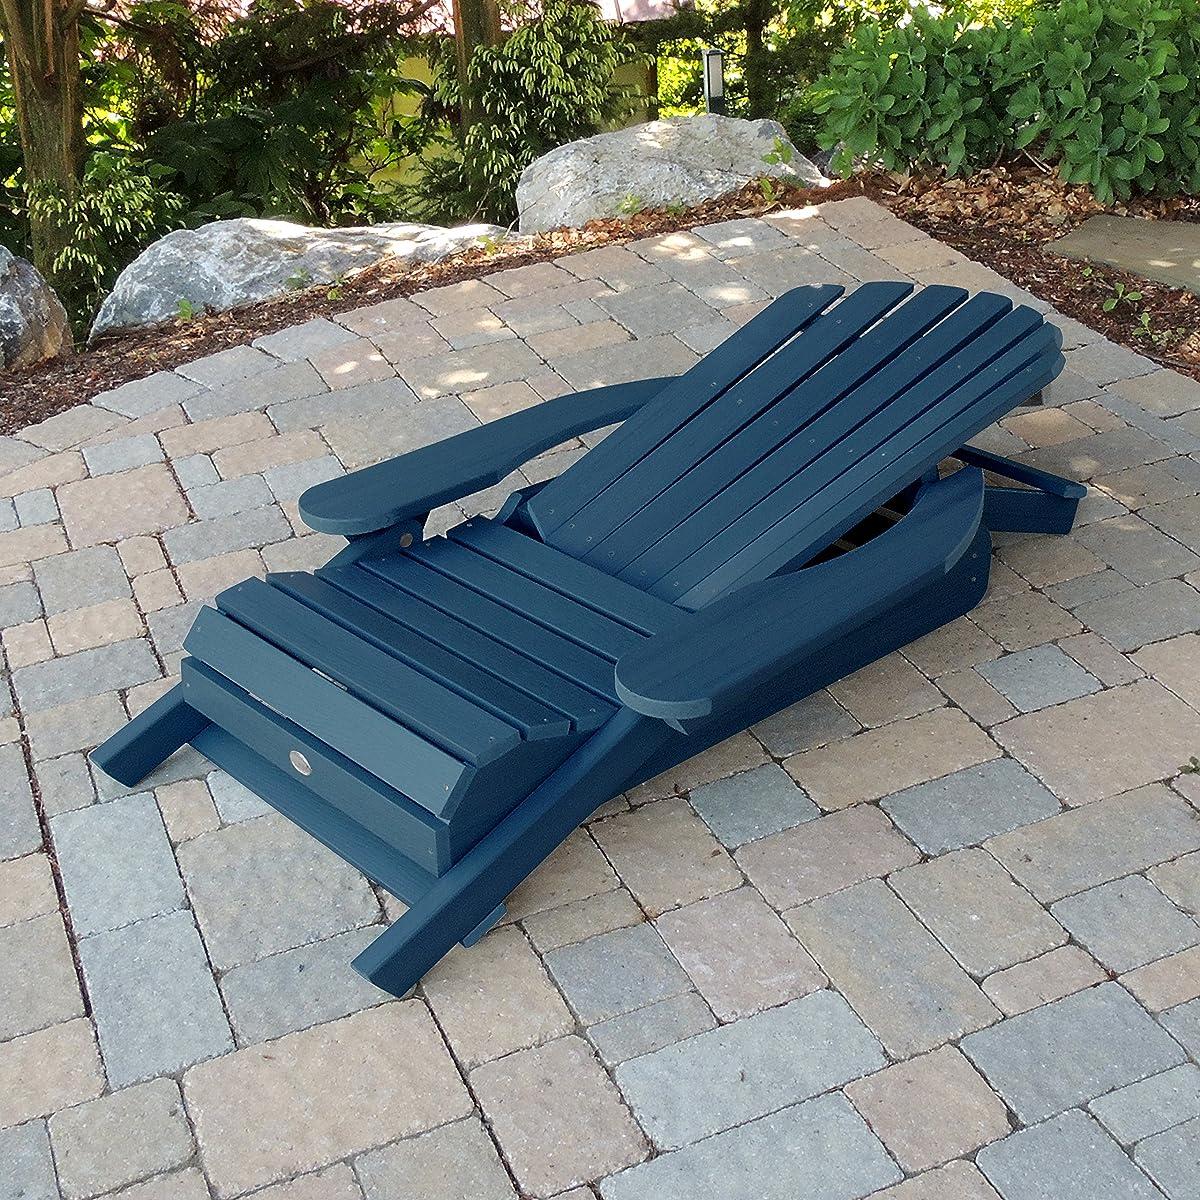 Highwood King Hamilton Folding and Reclining Adirondack Chair, Nantucket Blue